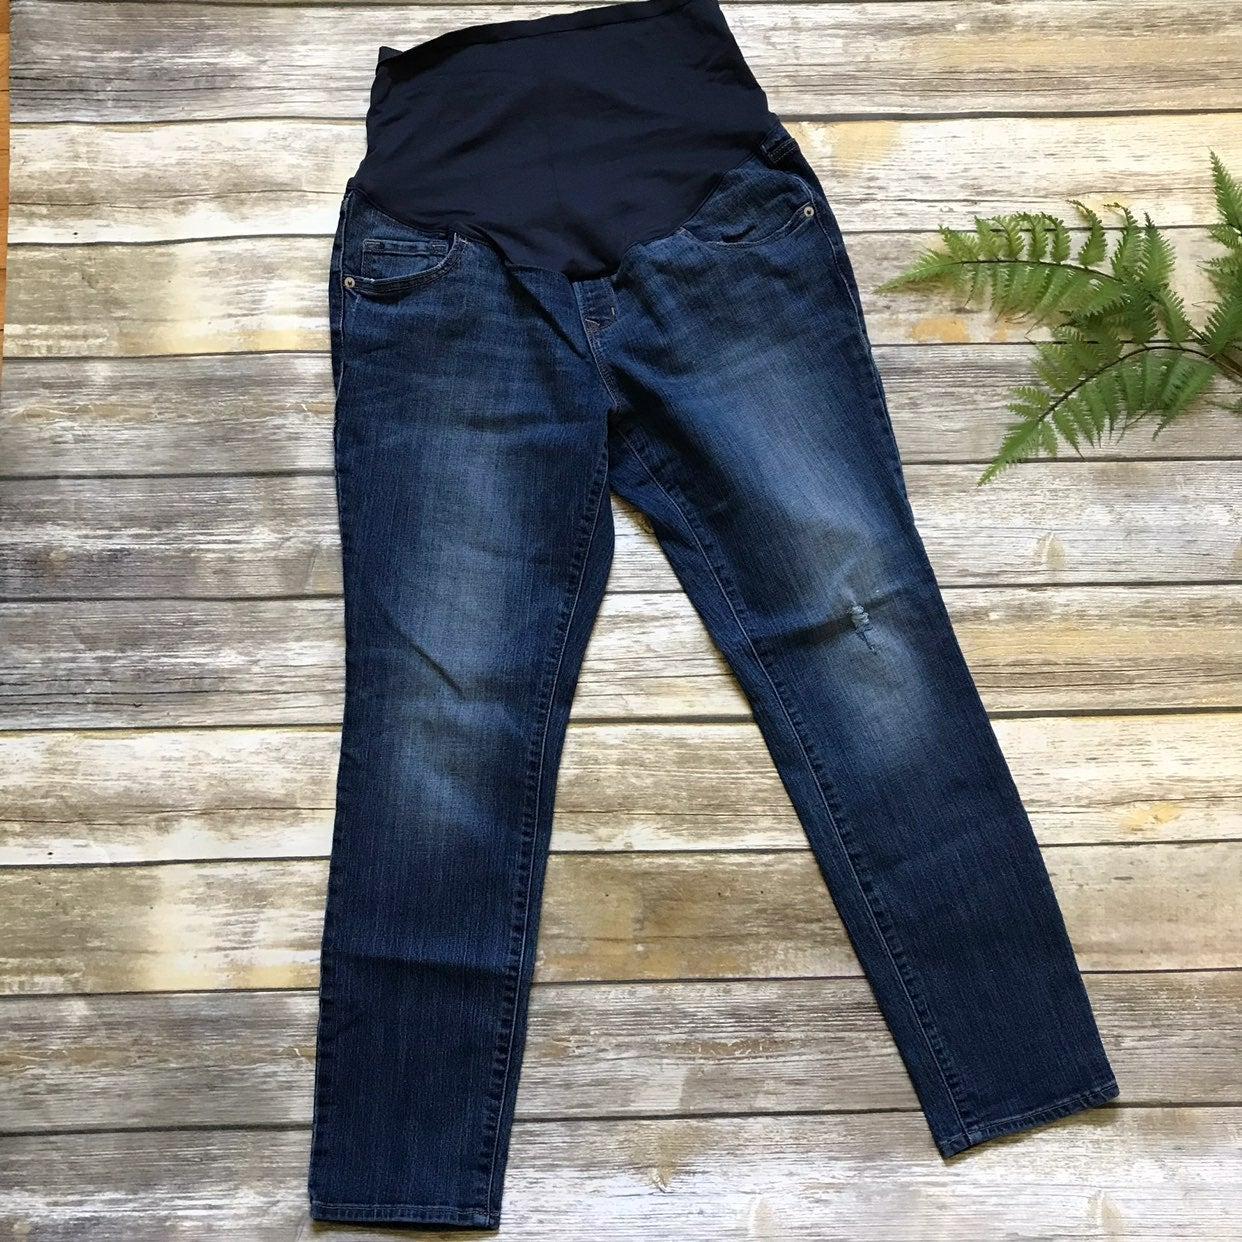 Old Navy Full Panel Maternity Jeans, 12S